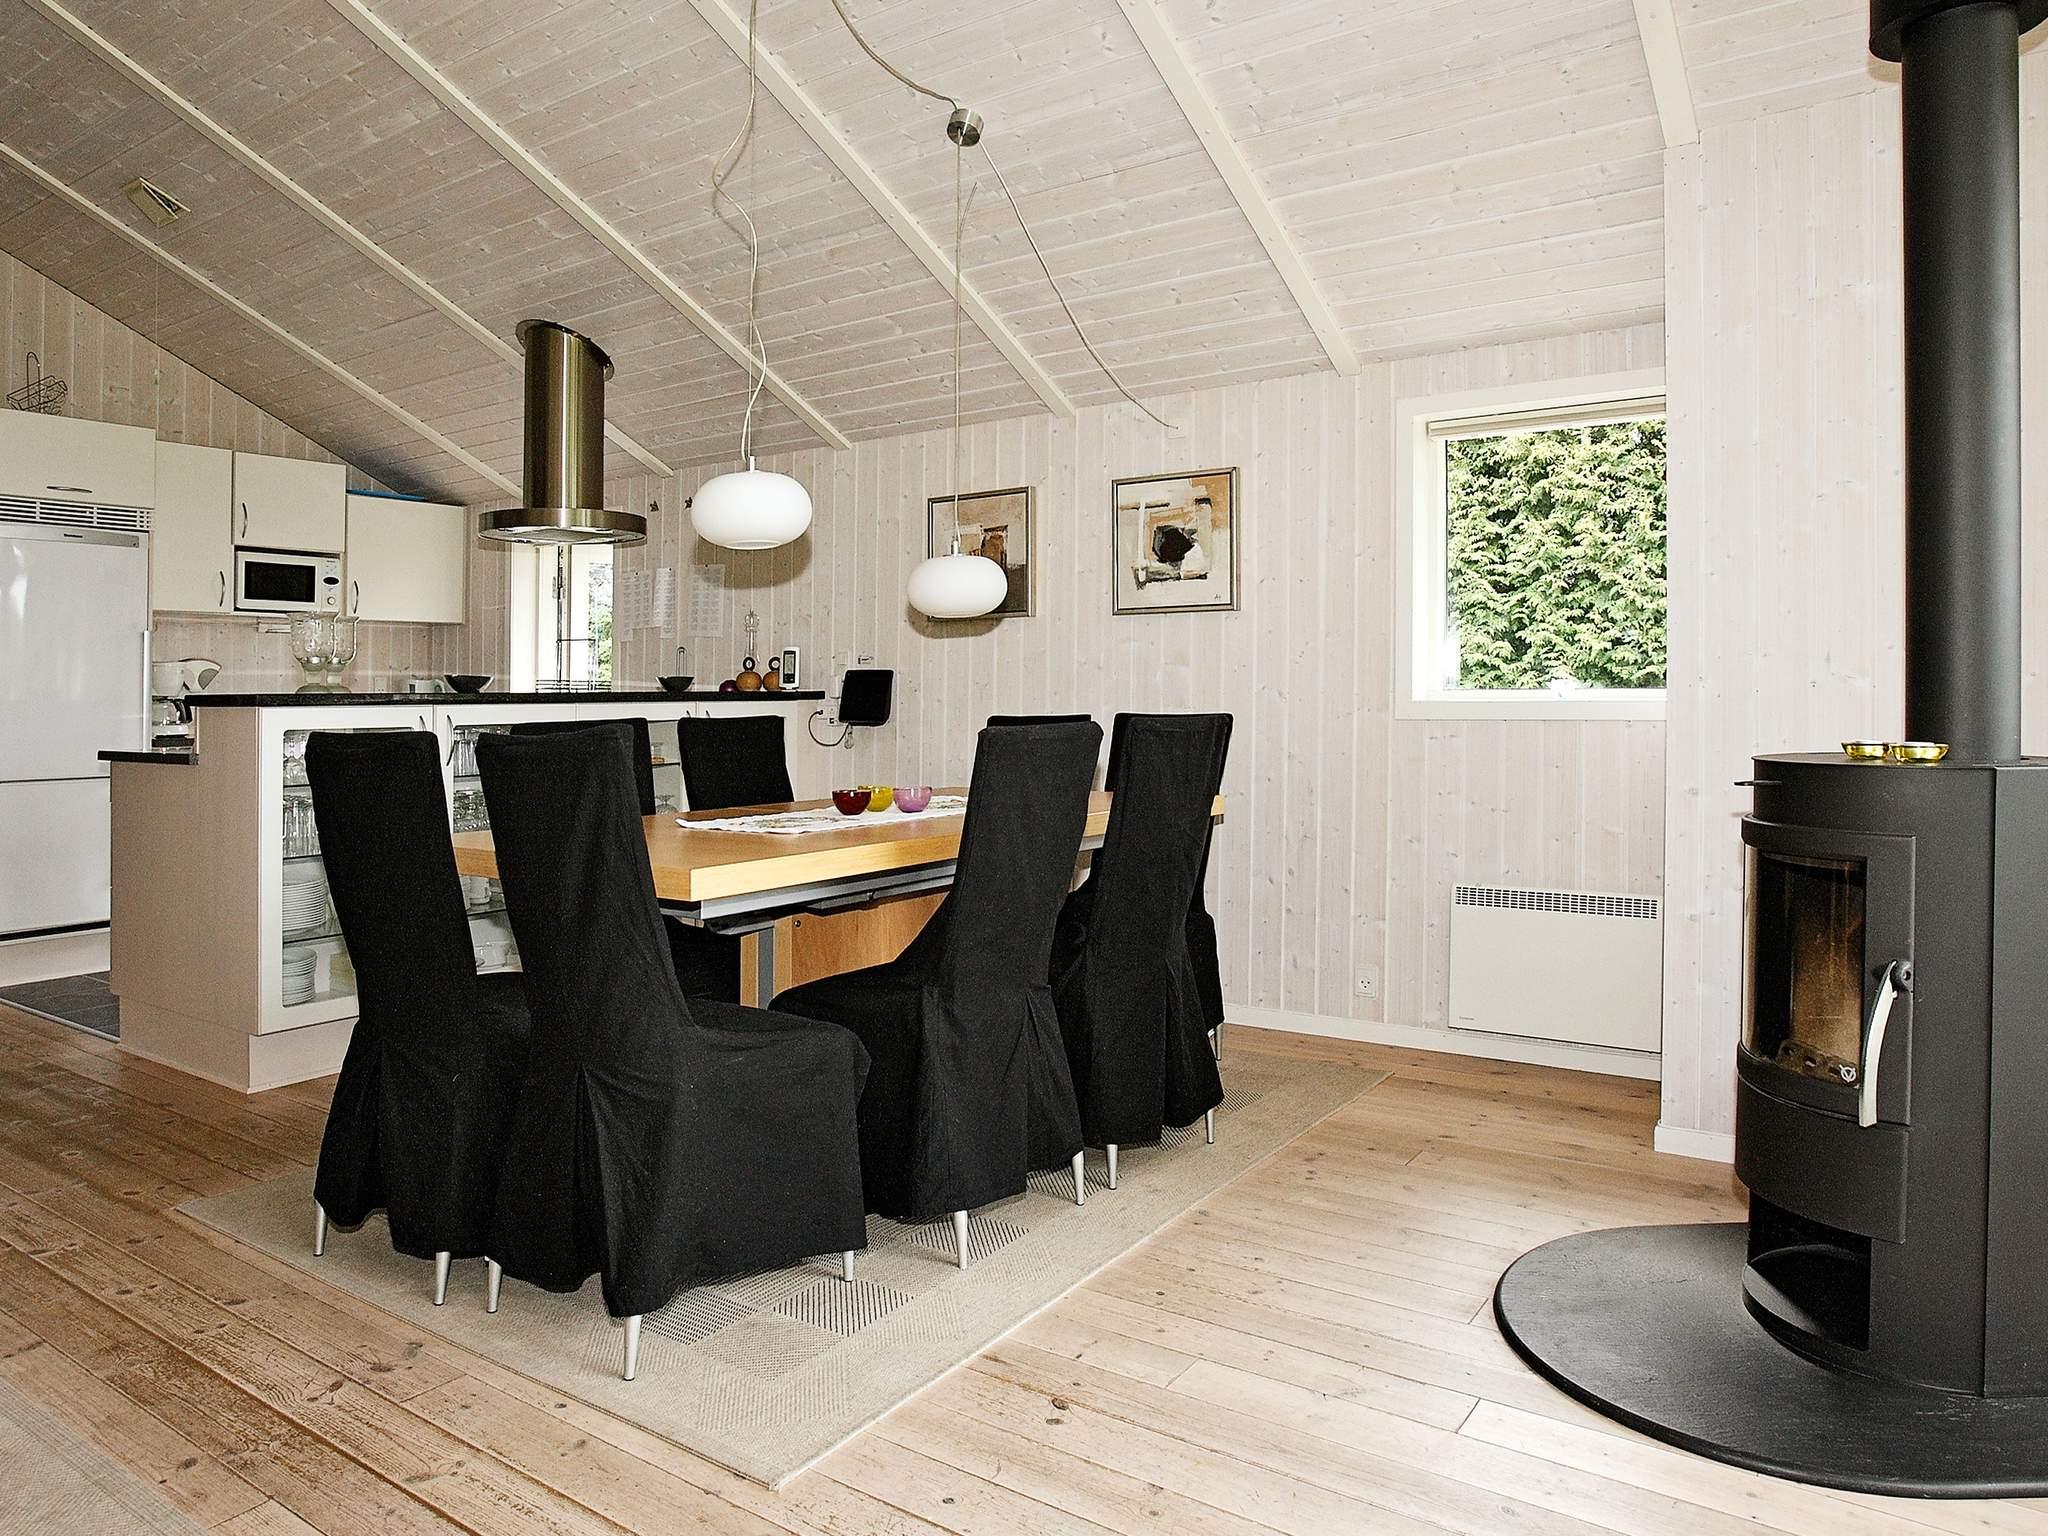 Ferienhaus Øster Hurup (1028934), Øster Hurup, , Ostjütland, Dänemark, Bild 5